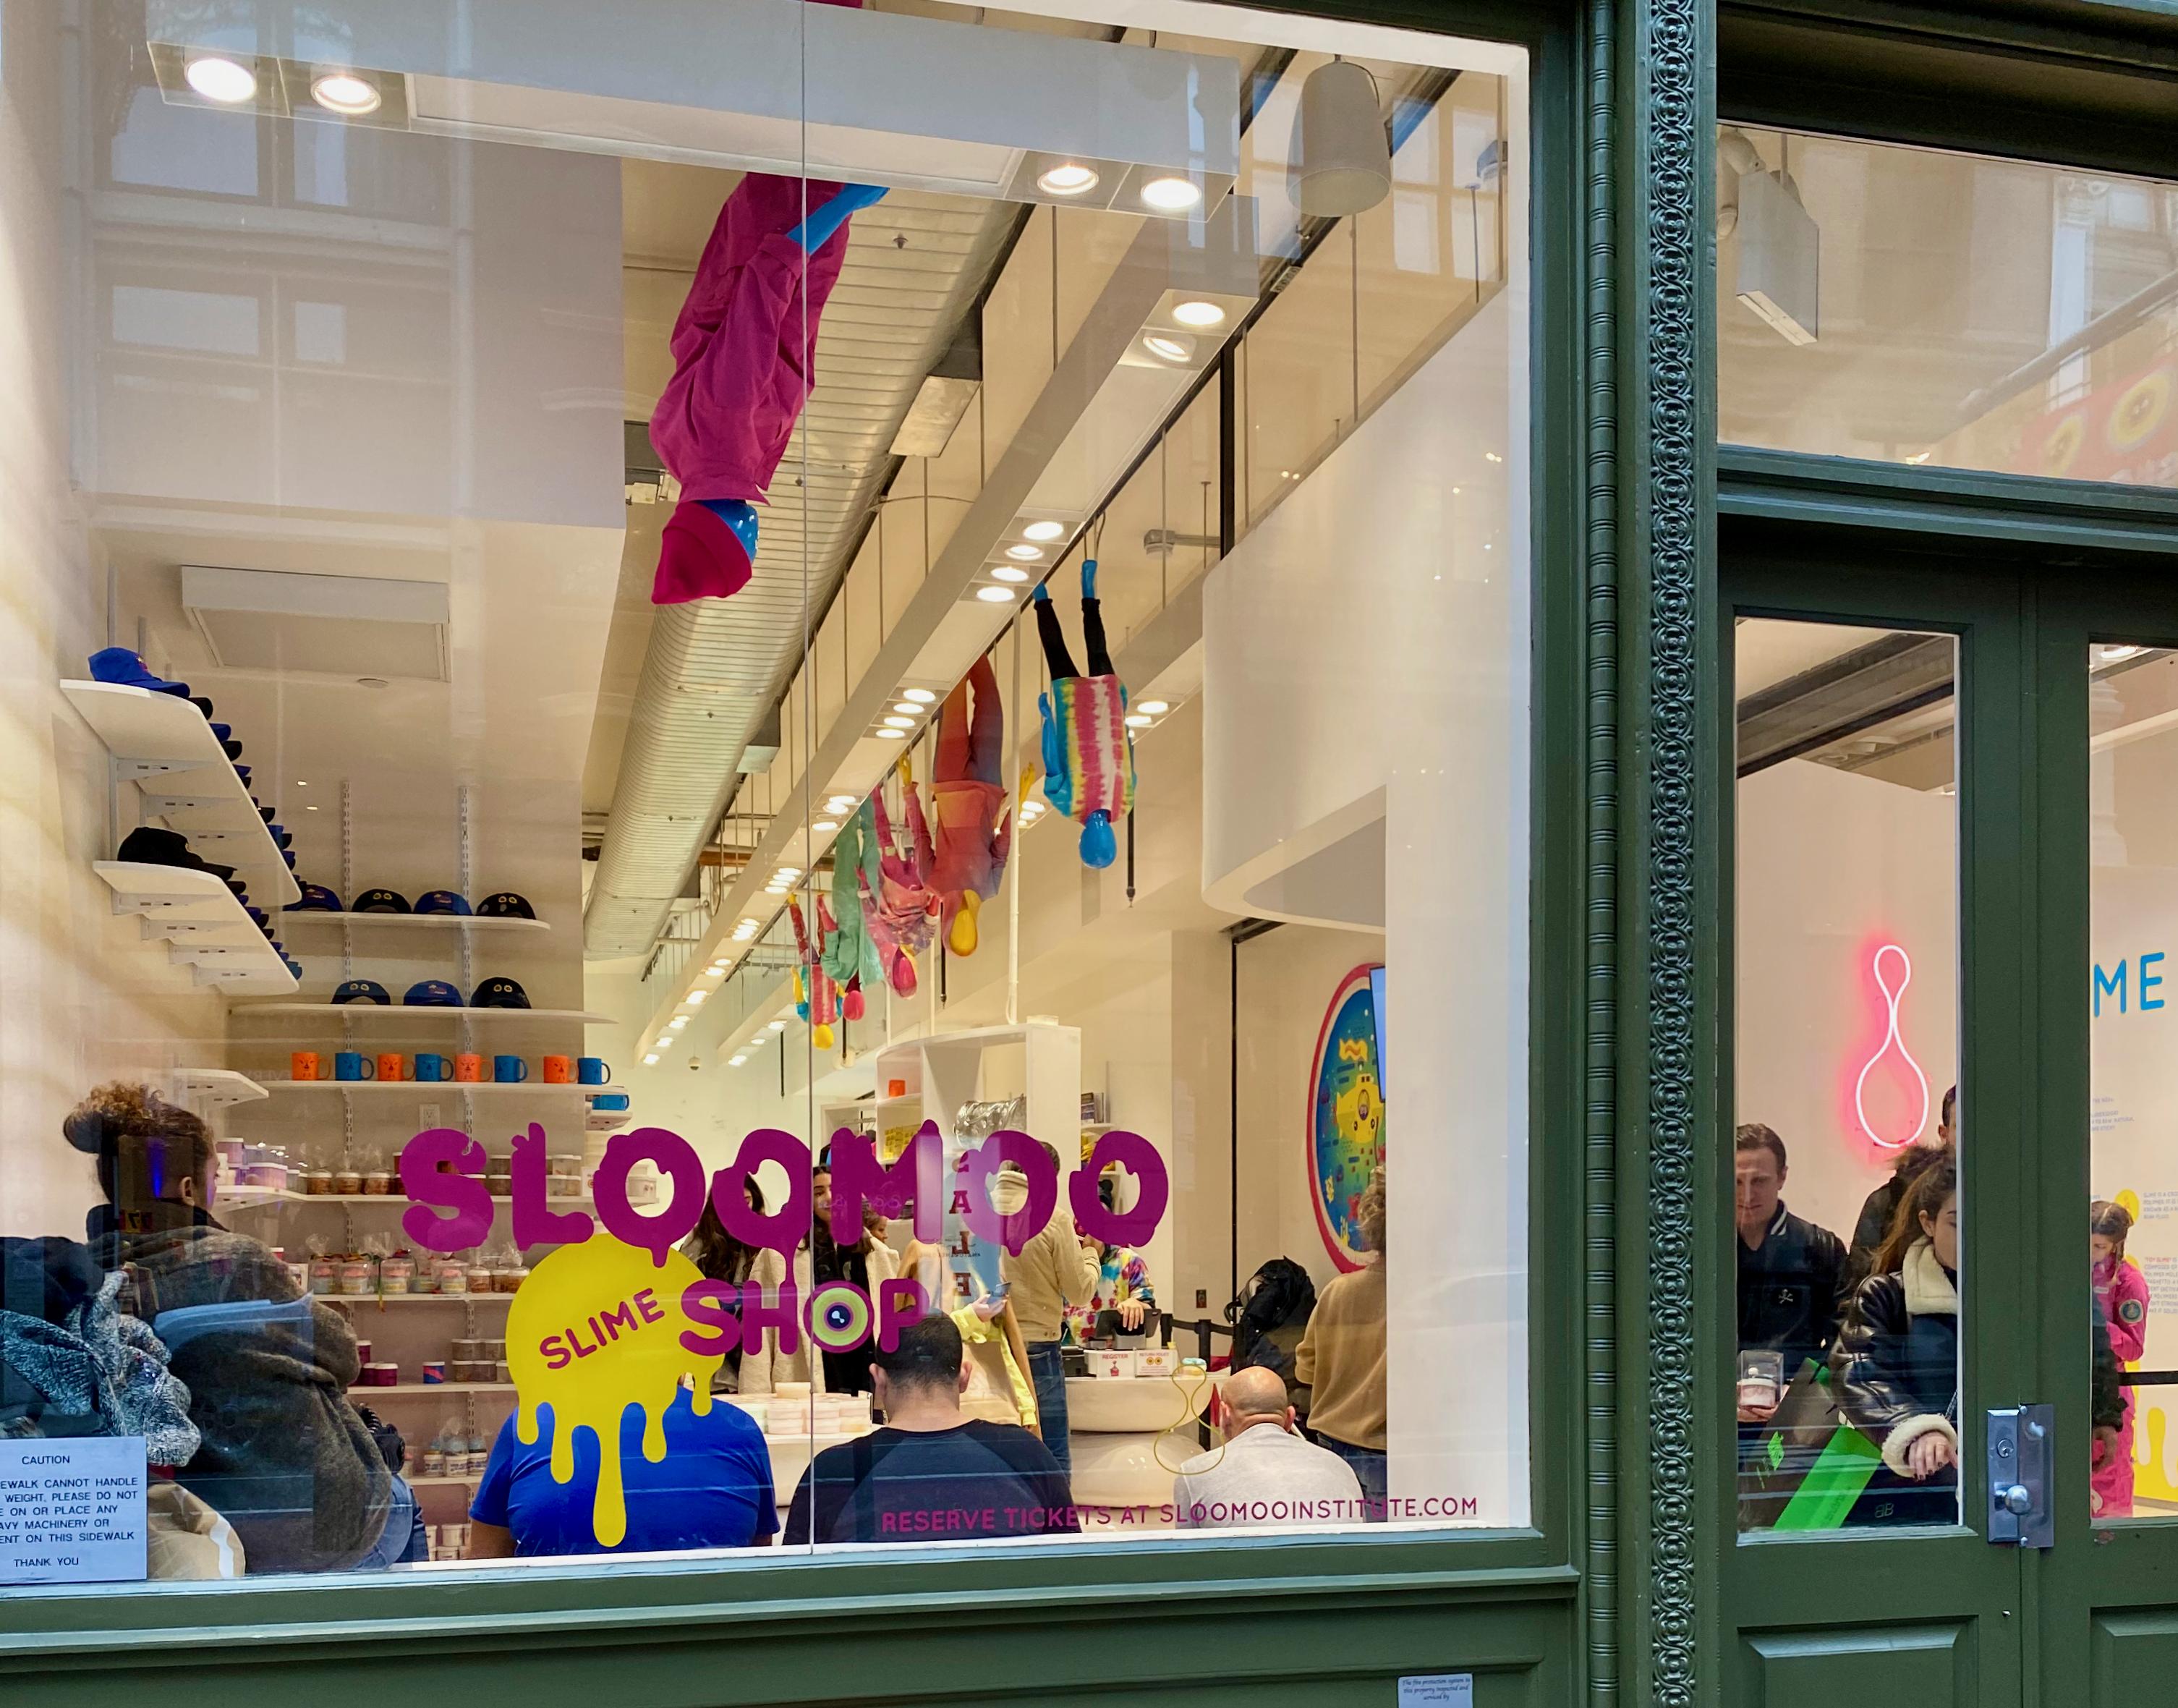 Sloomoo institute new york city